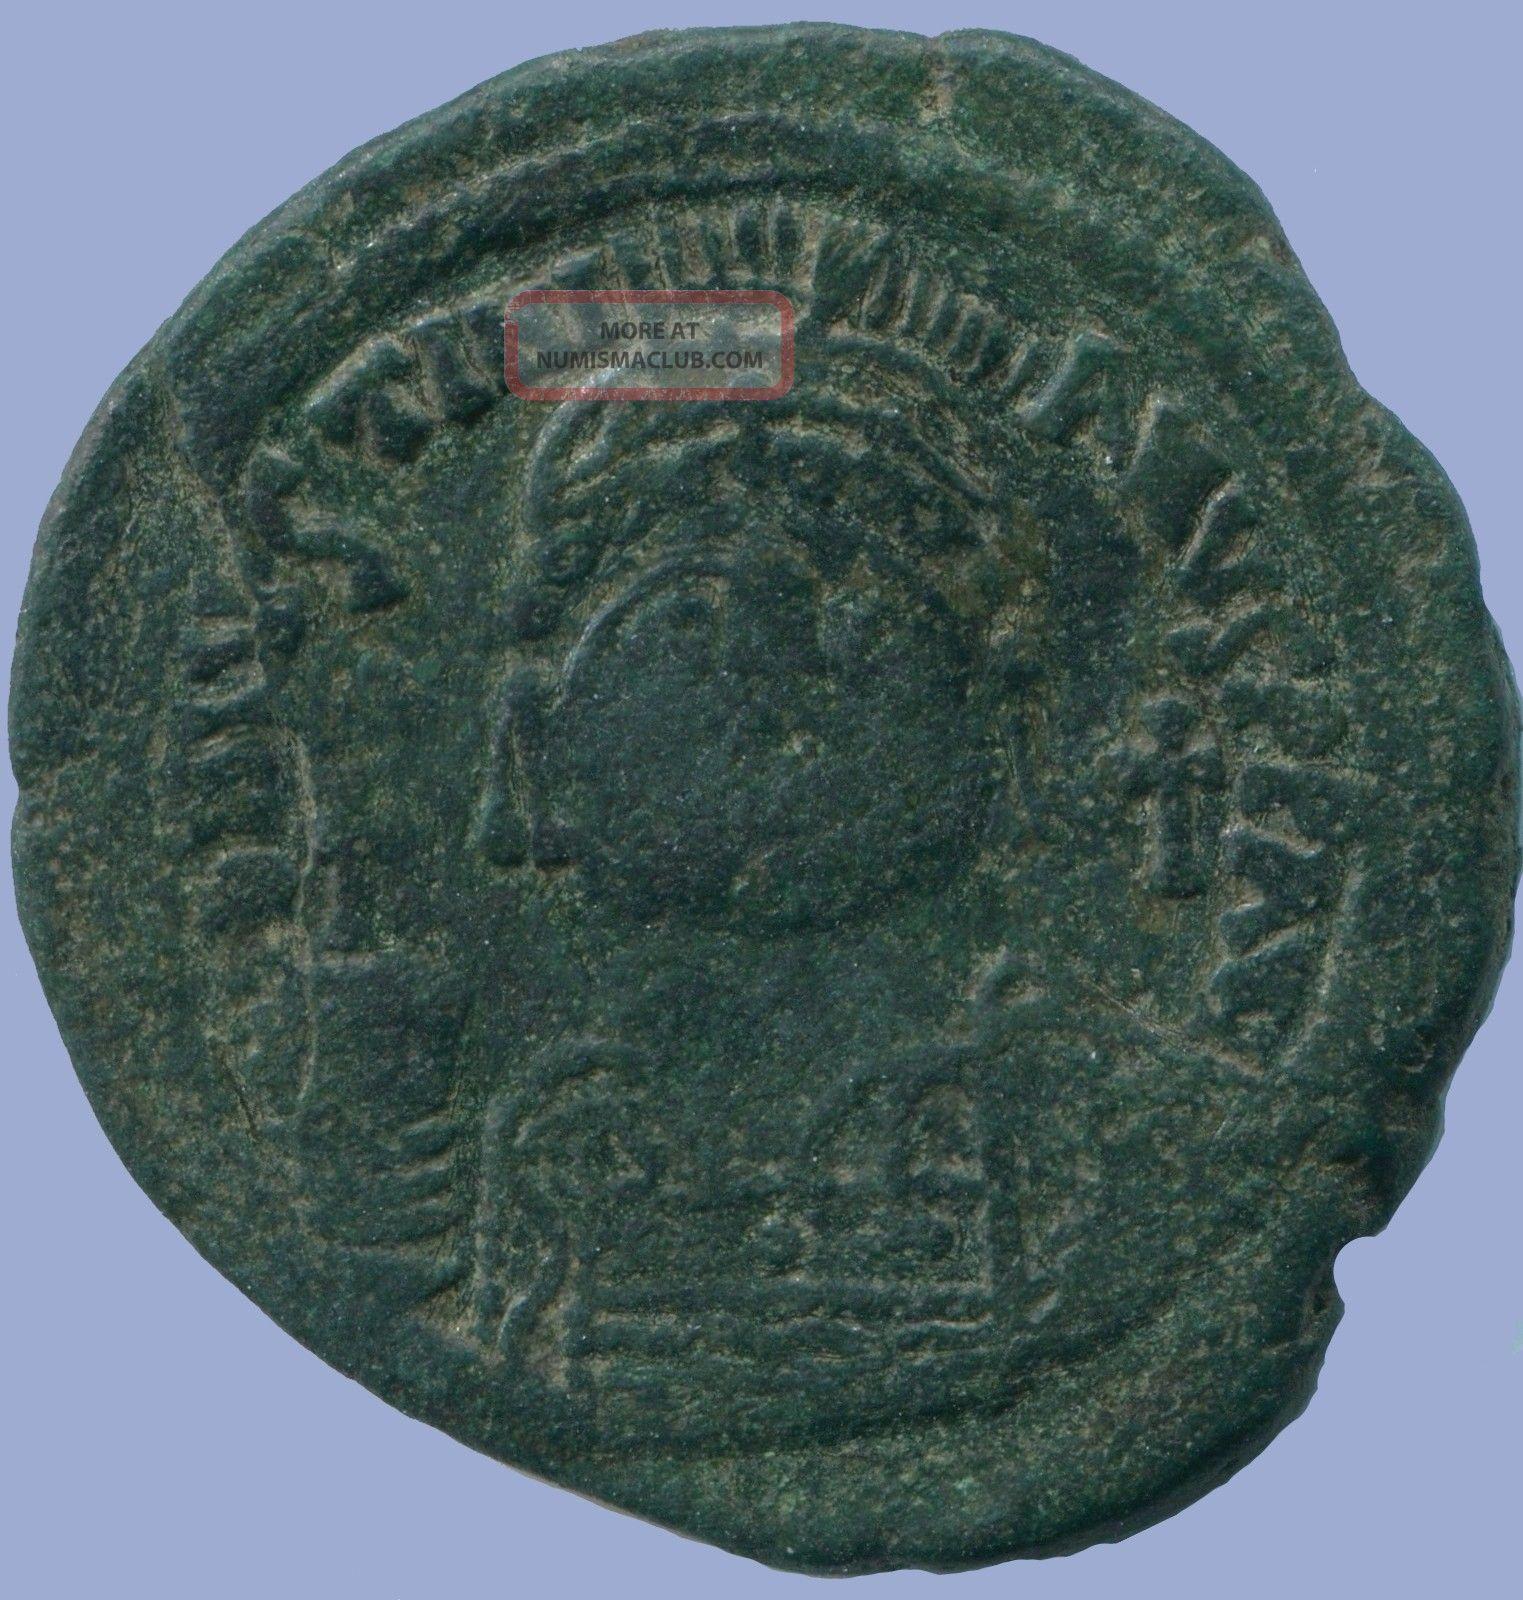 Justinian I Æ Follis Constantinople 542/543 18.  01 G/35.  58 Mm Anc13668.  16 Coins: Ancient photo